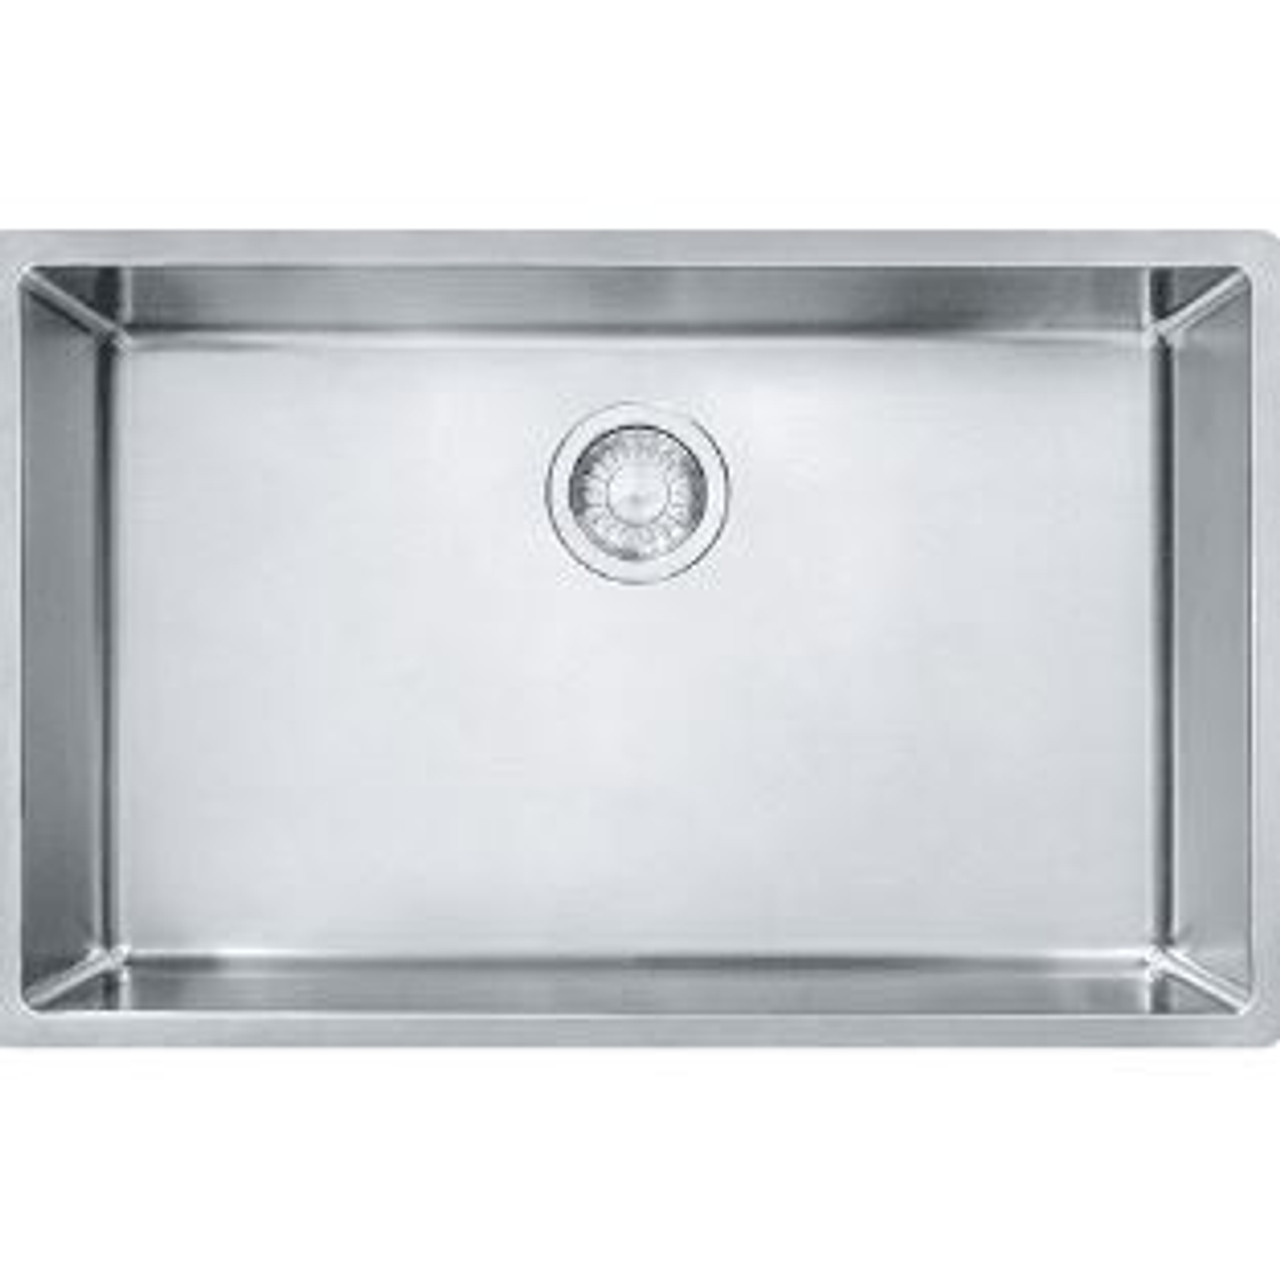 franke cux11027 cube 28 1 2 single basin undermount stainless steel kitchen sink